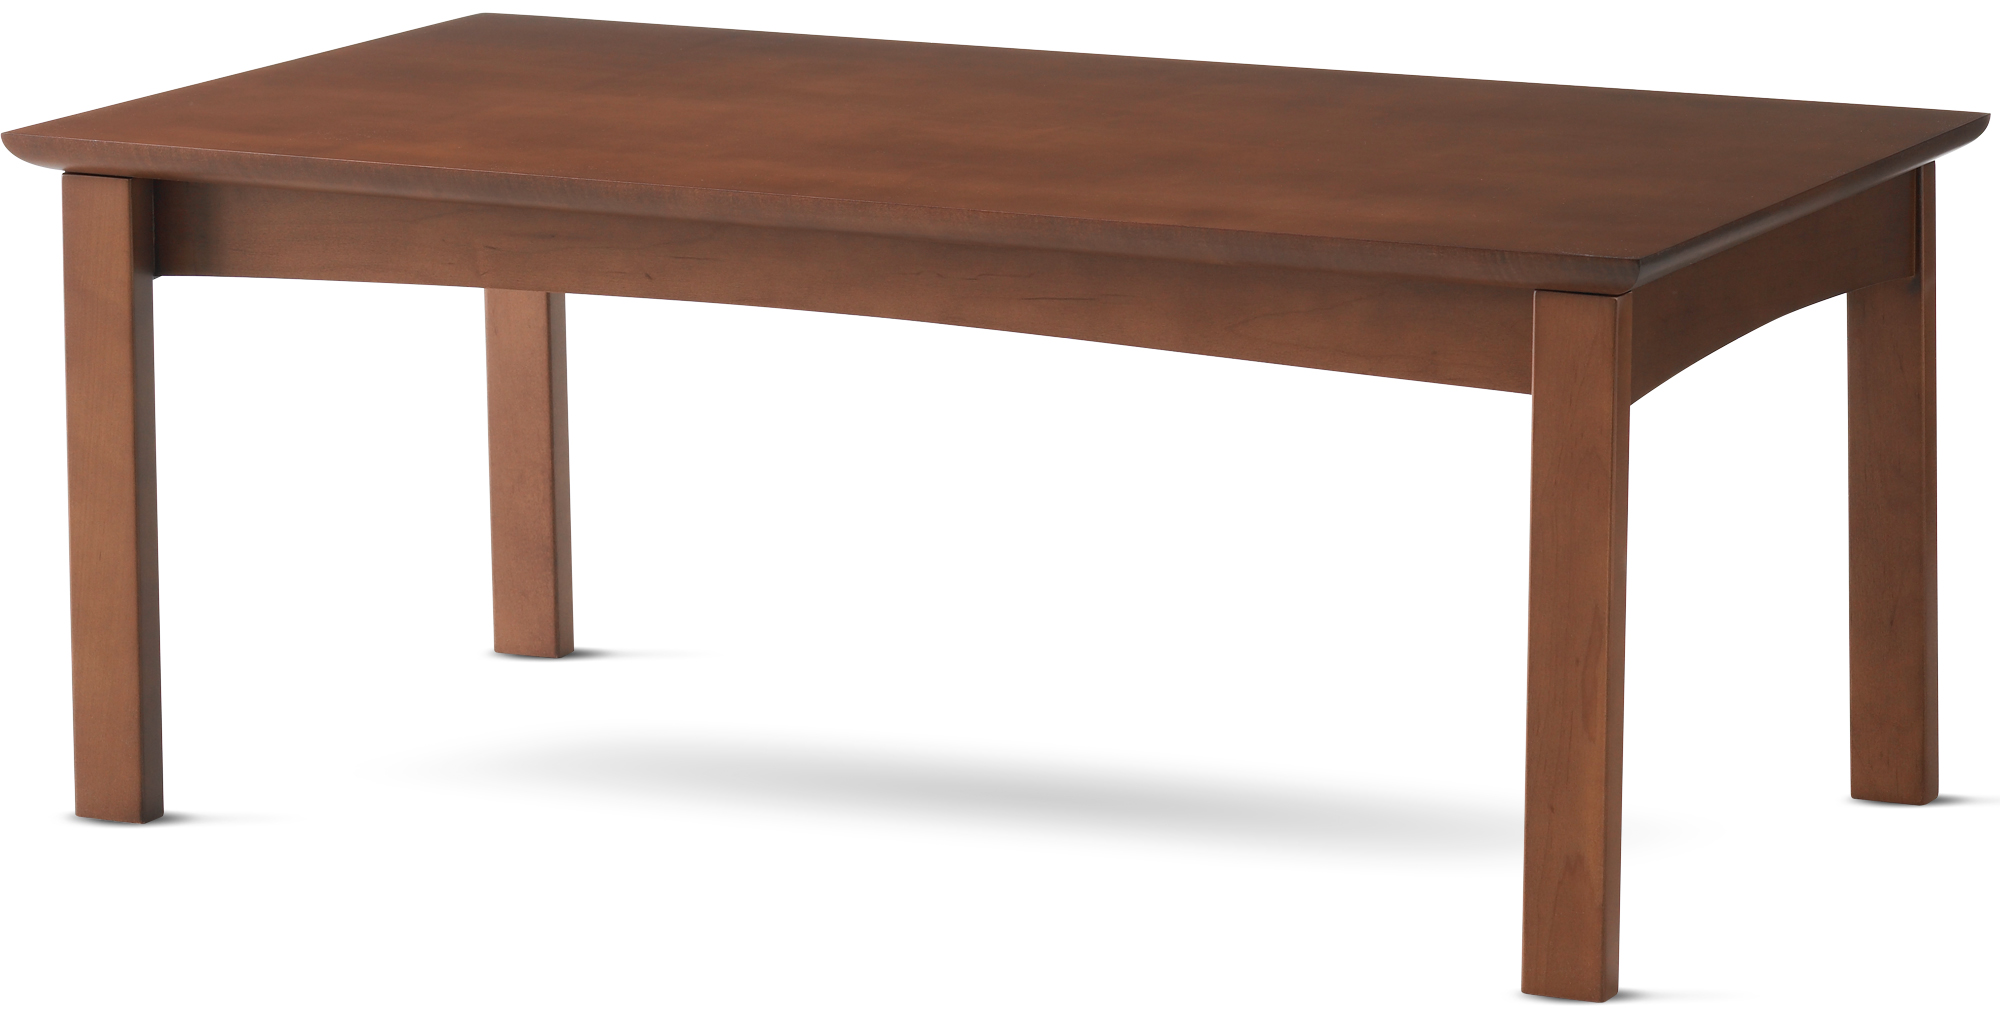 Imagine Table 7480 70 1024x2000px 150dpi